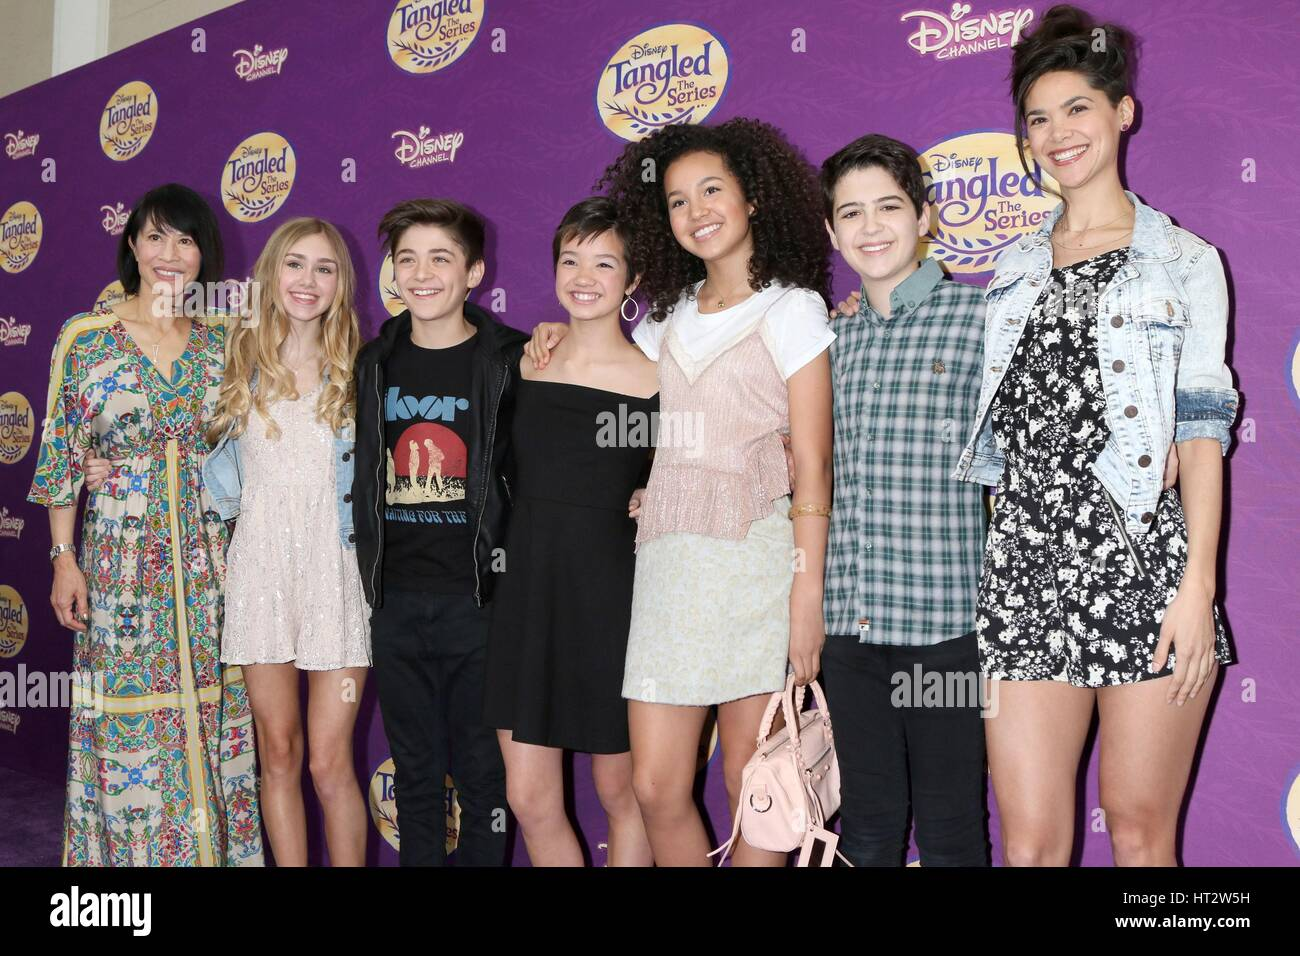 Los Angeles, CA, USA. 4th Mar, 2017. Lauren Tom, Emily Skinner, Asher Angel, Peyton Elizabeth Lee, Sofia Wylie, - Stock Image